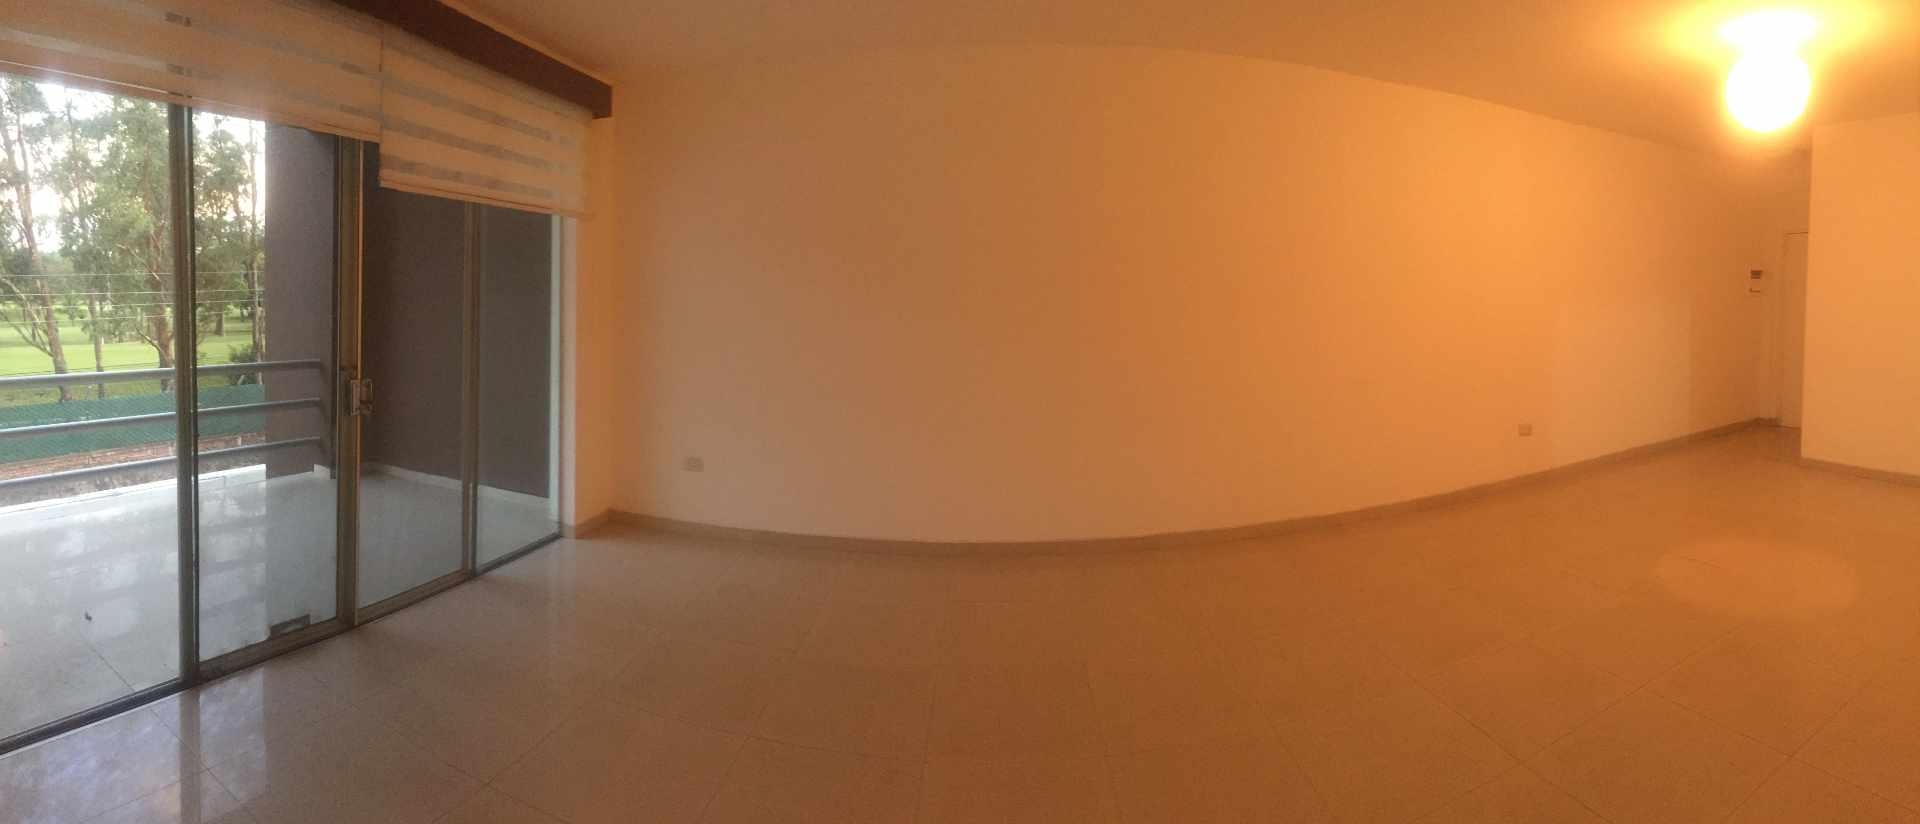 Departamento en Alquiler Calle Yaguarú, Condominio Las Palmas Residence Foto 9